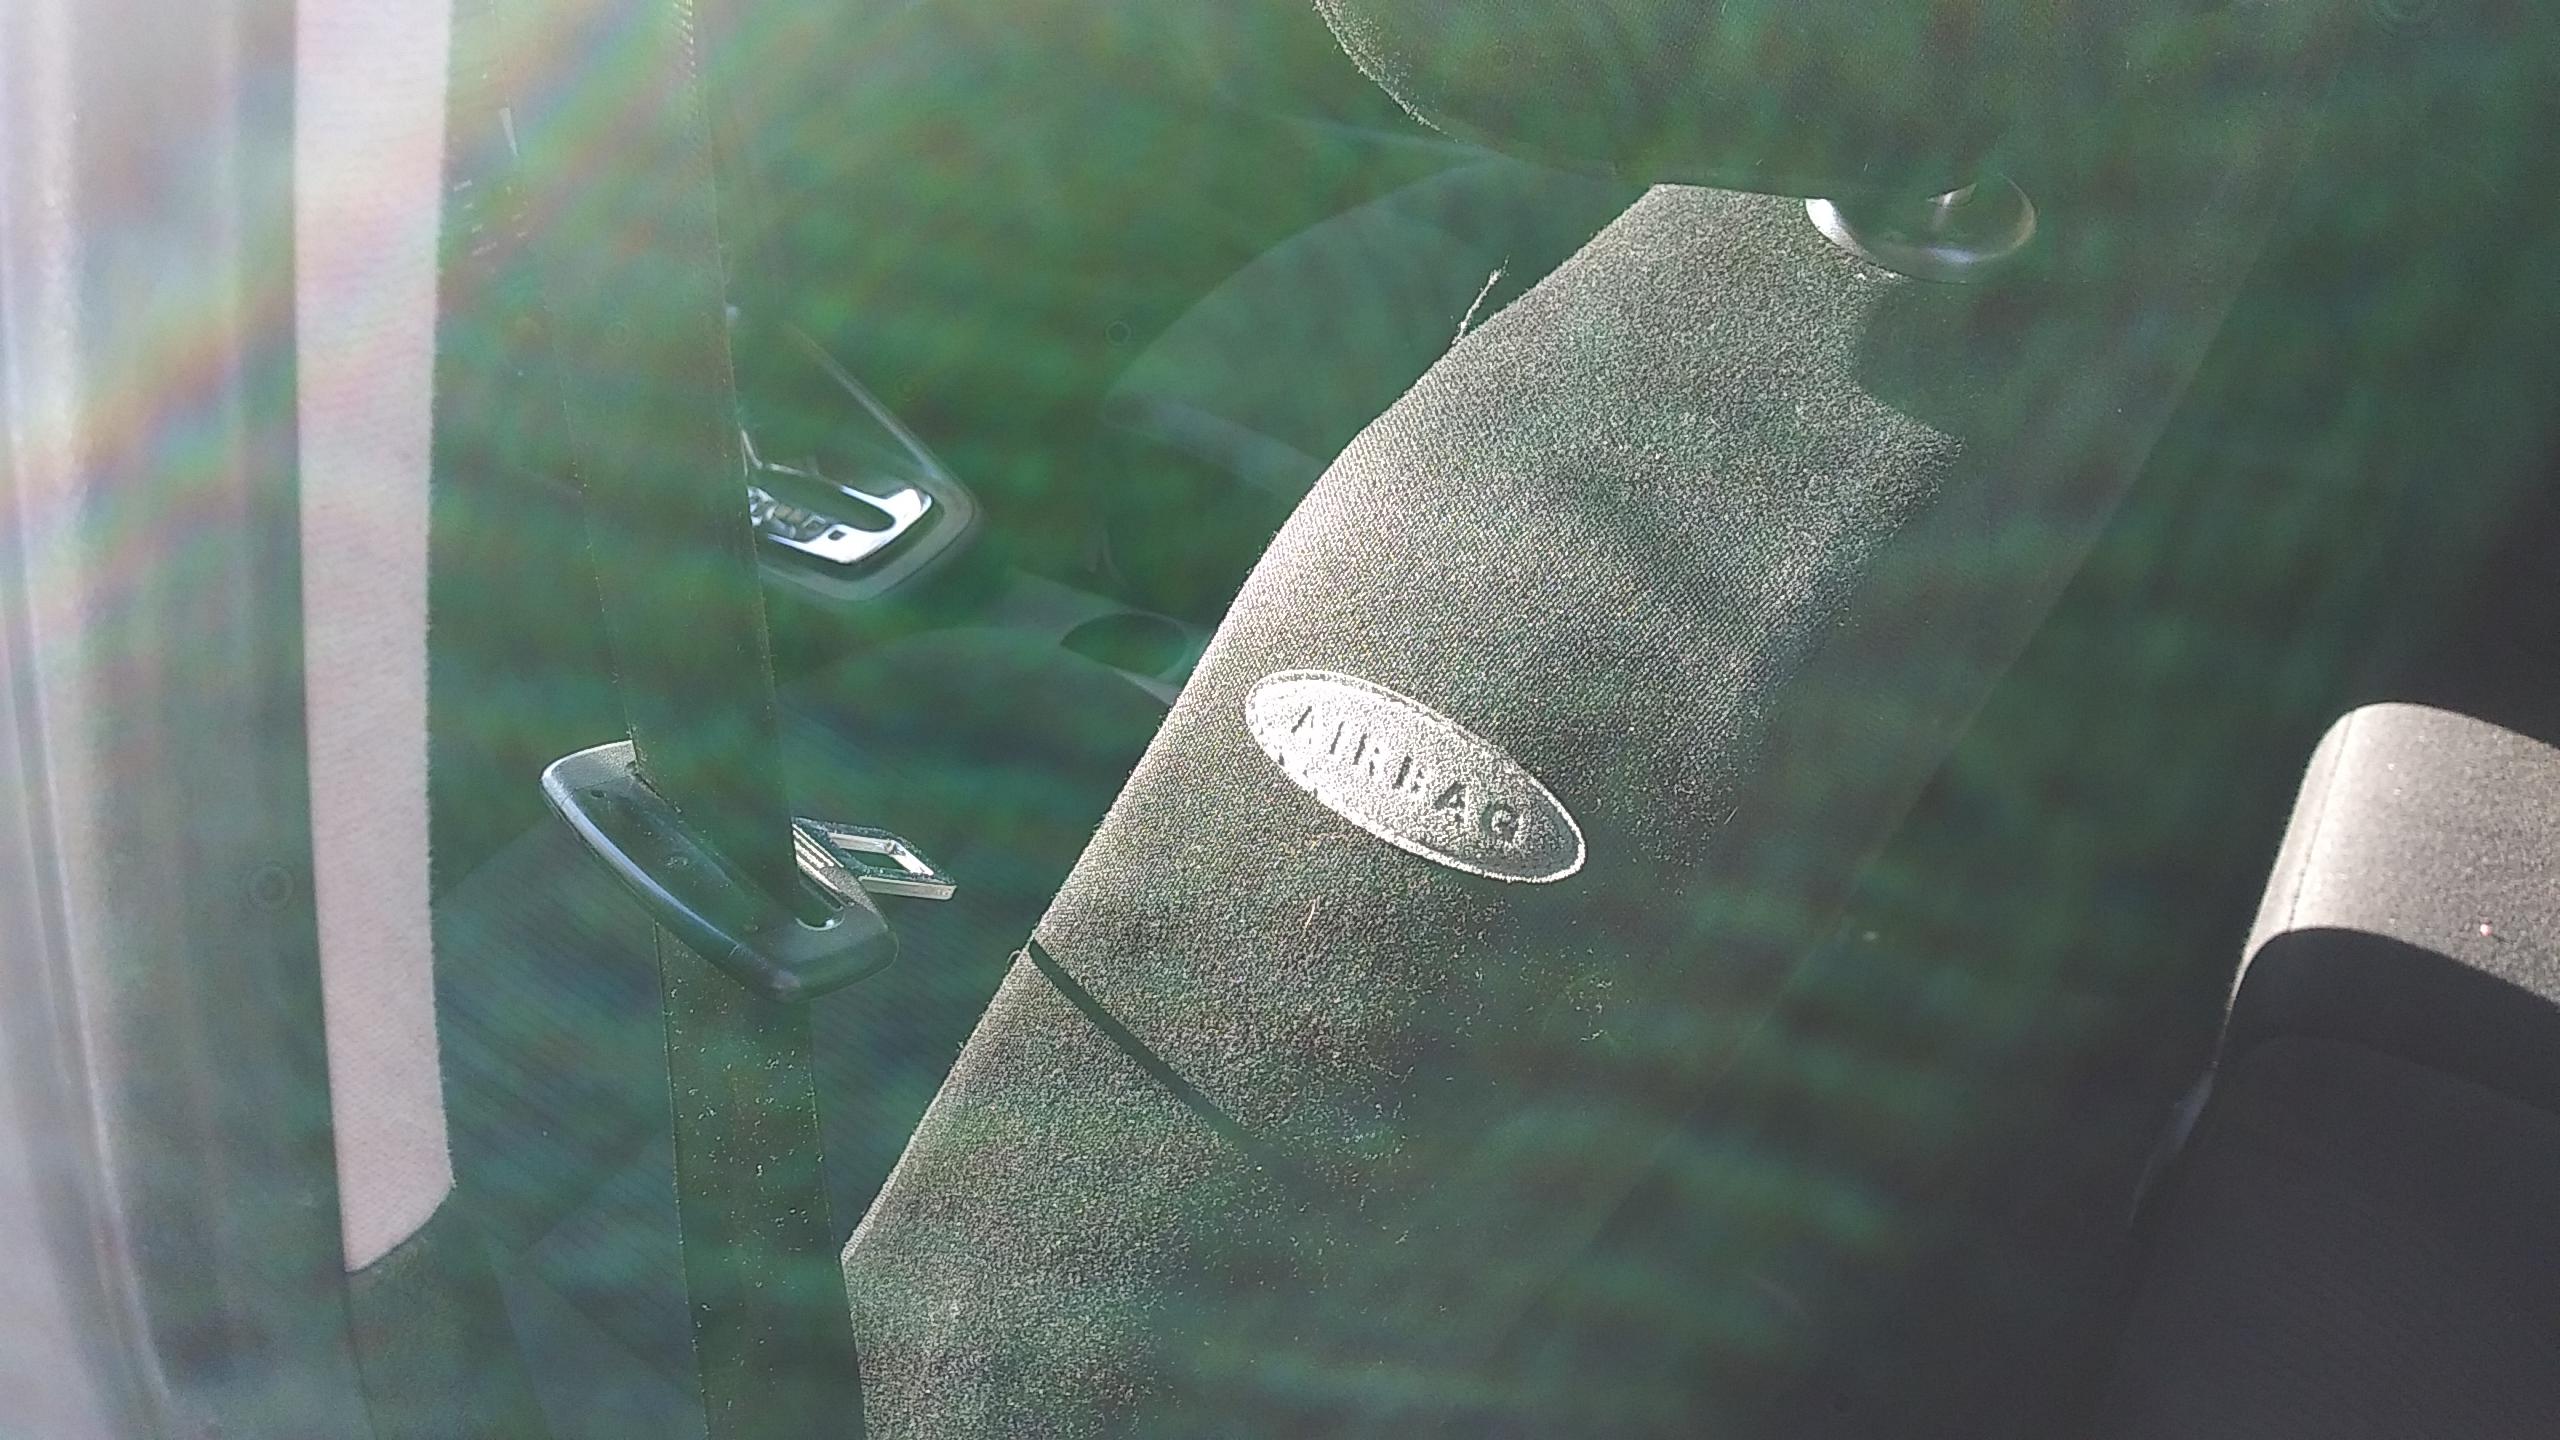 2005 VG Jetta Wagon (13)